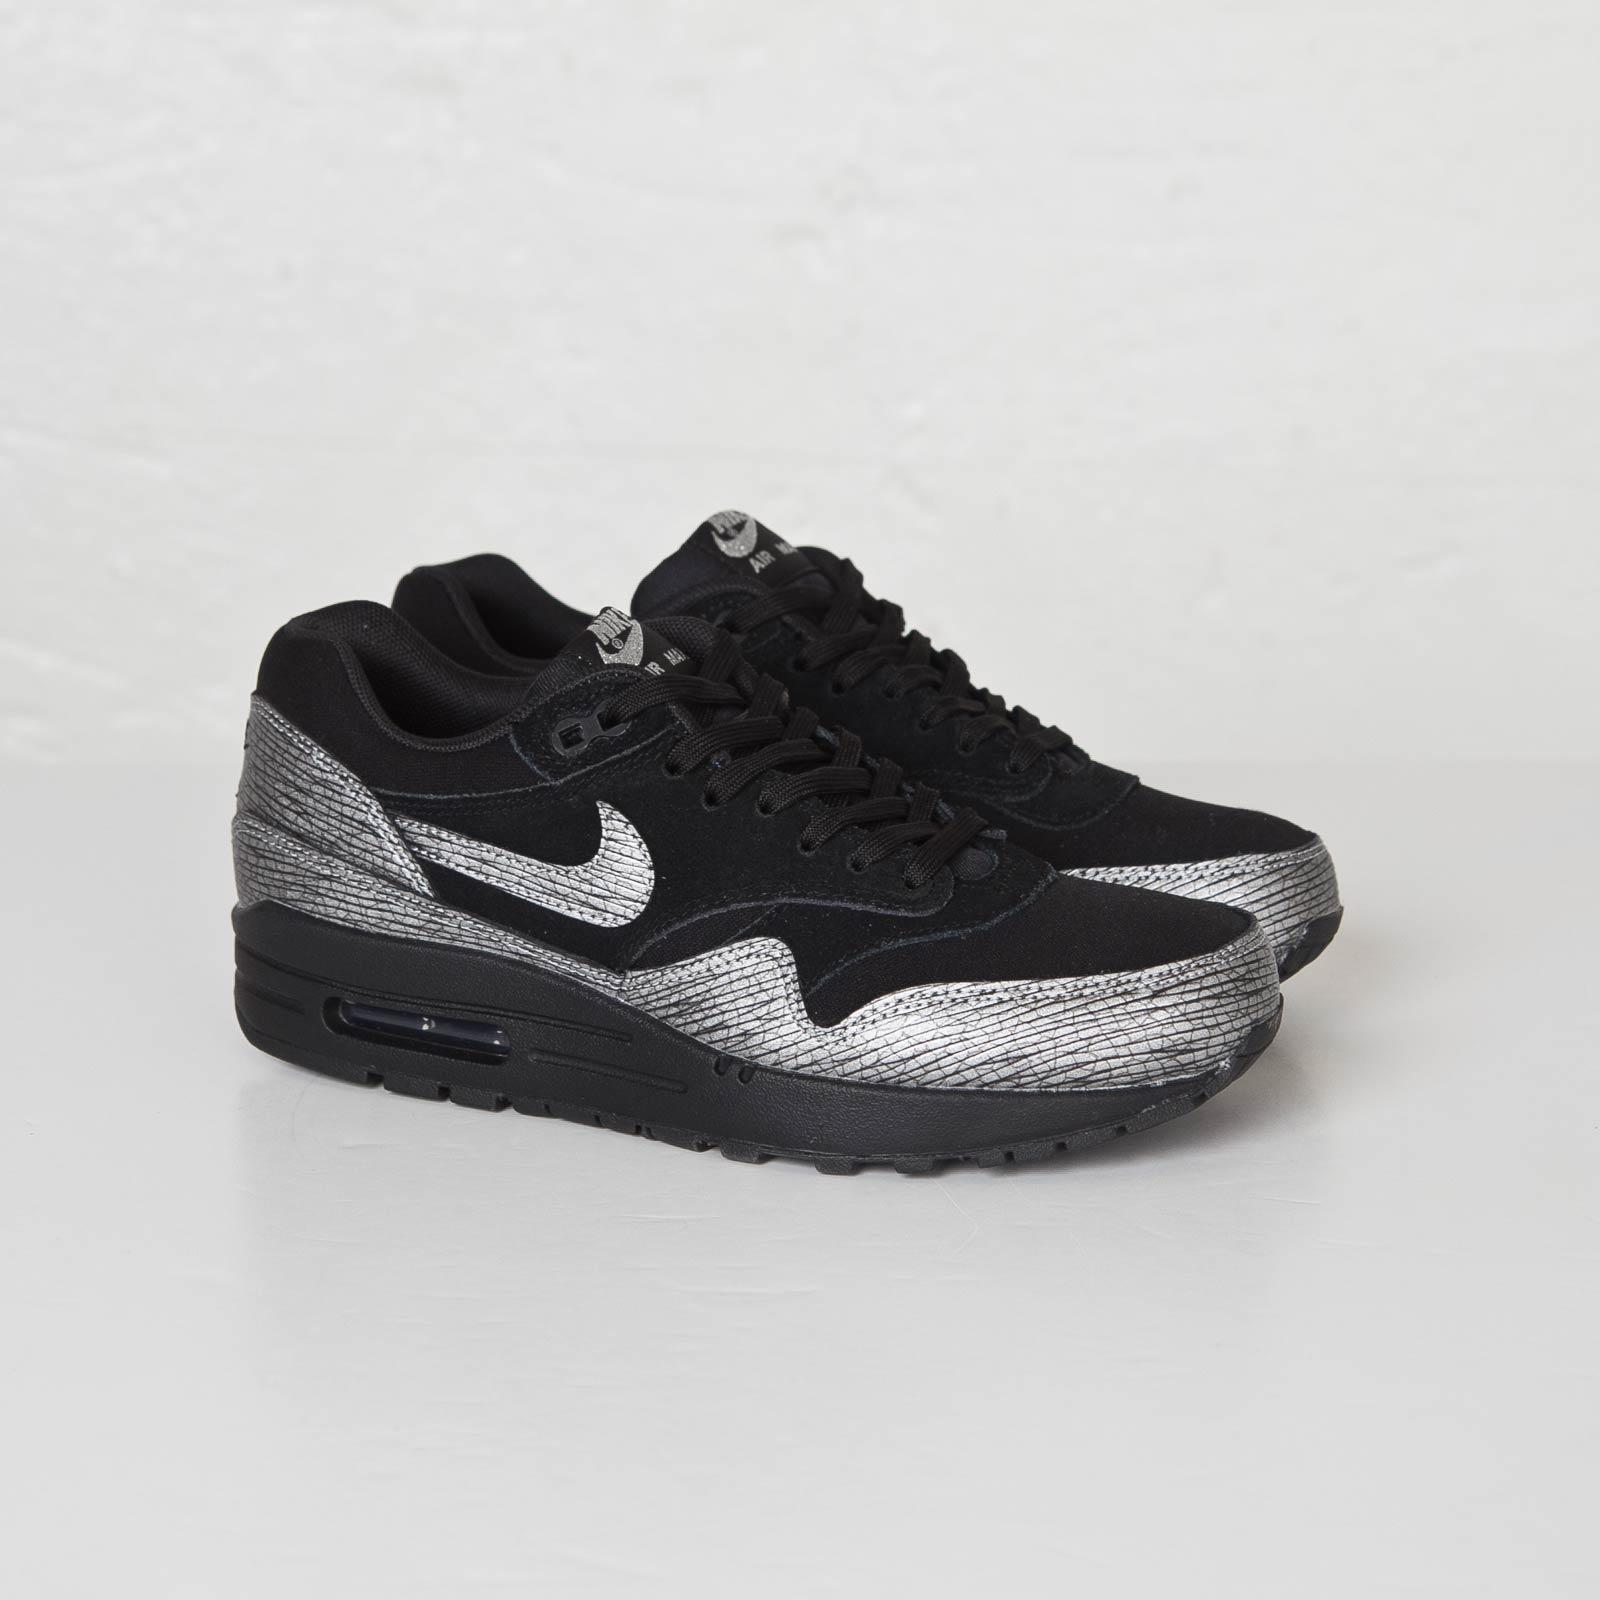 promo code aada6 c0120 Nike Wmns Air Max 1 Premium